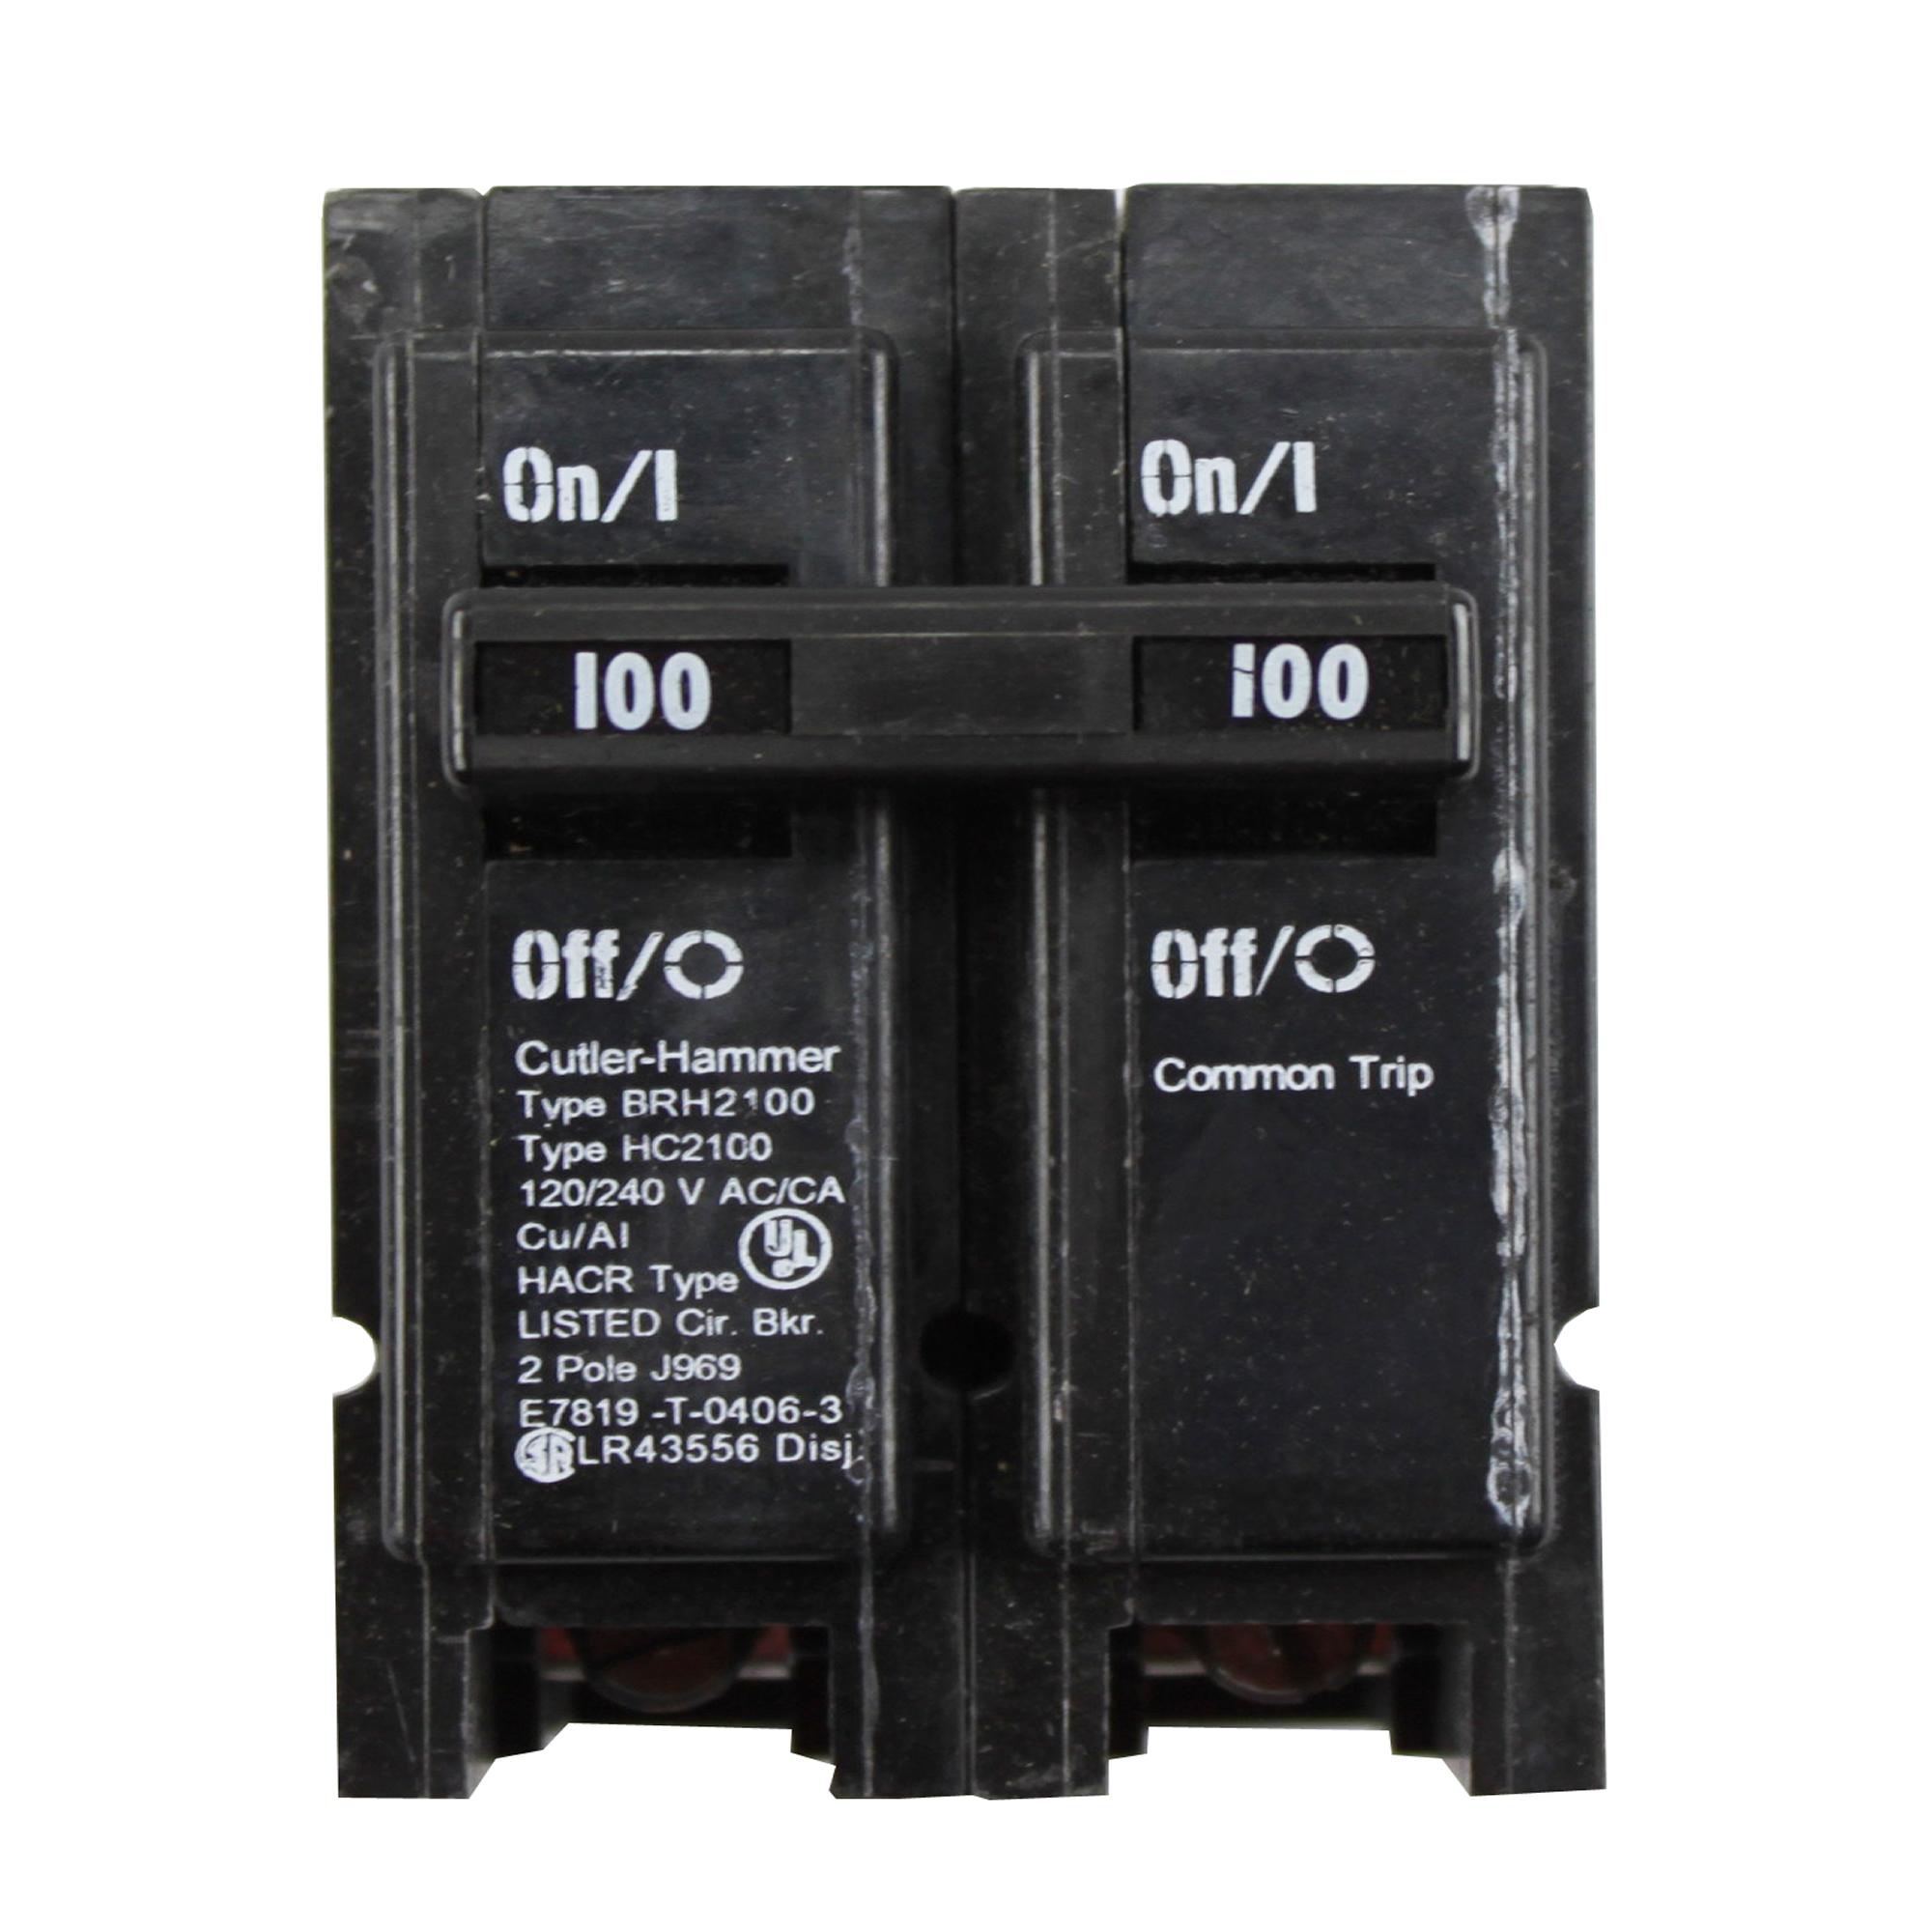 Eaton Cutler-Hammer BRH2100 100A 2P 120/208/240V Circuit Breaker  - Black